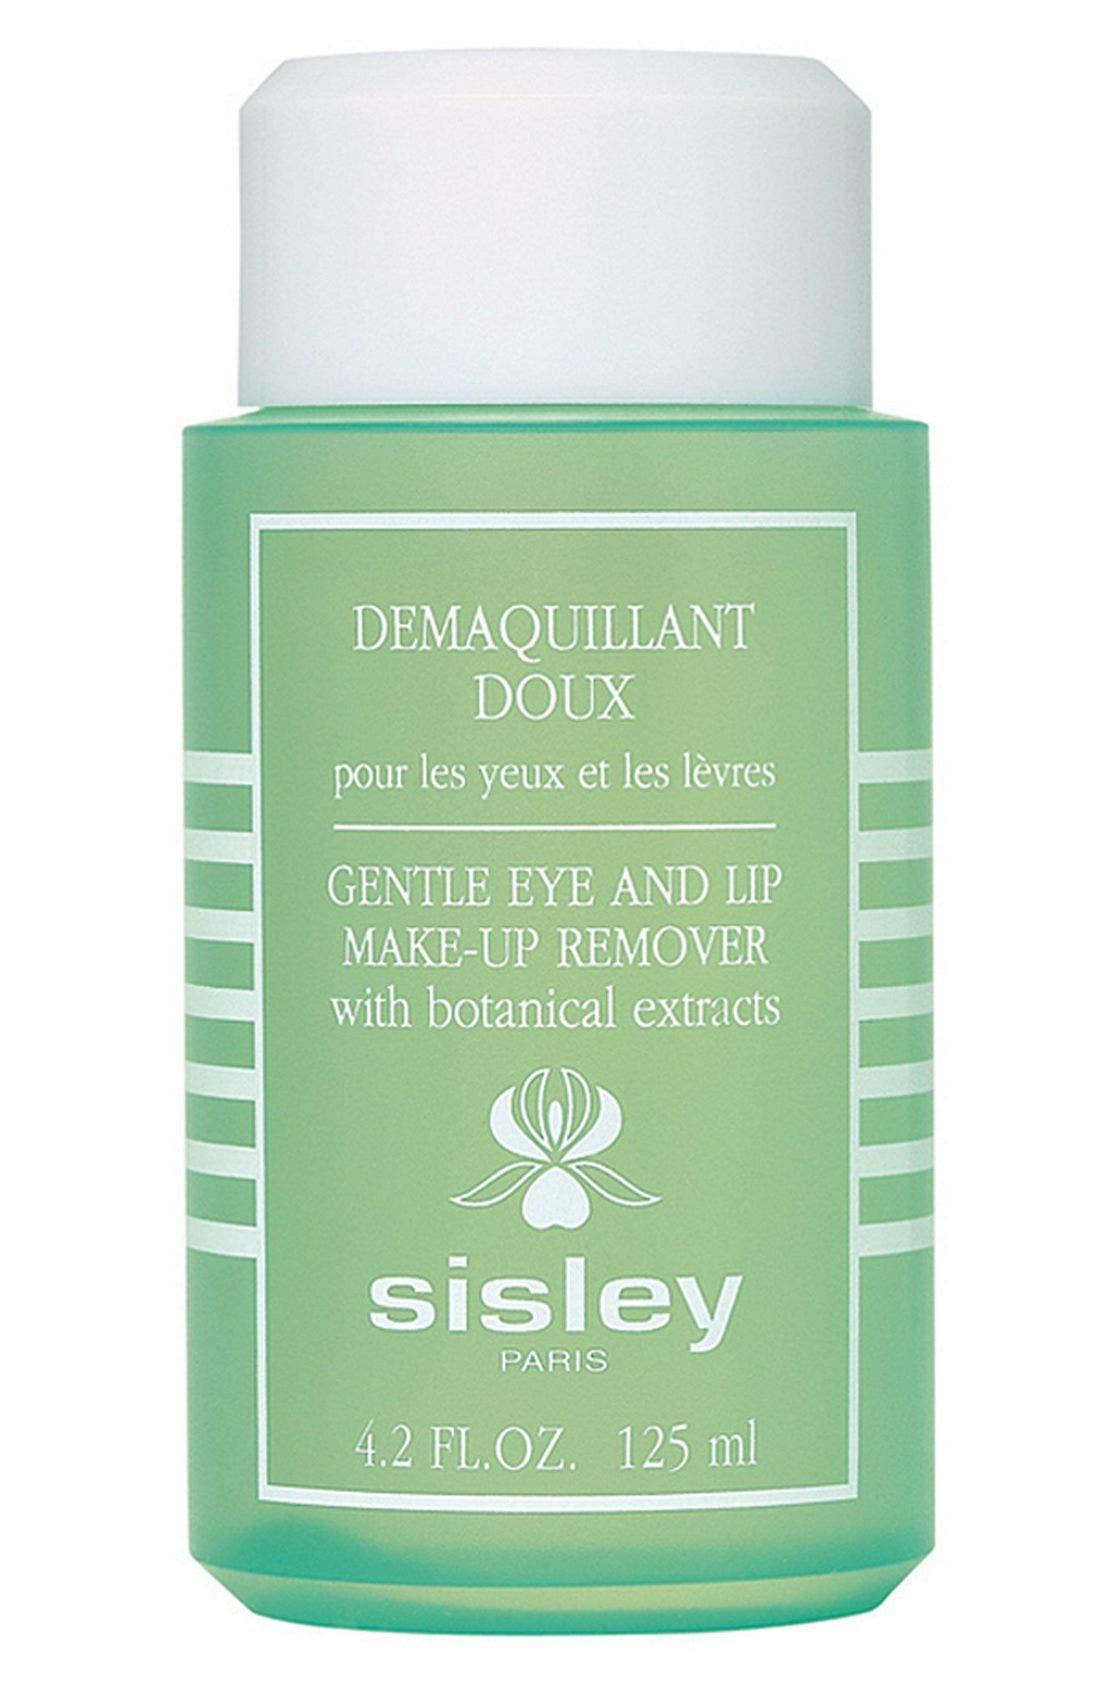 Sisley Paris Gentle Eye and Lip Make-Up Remover